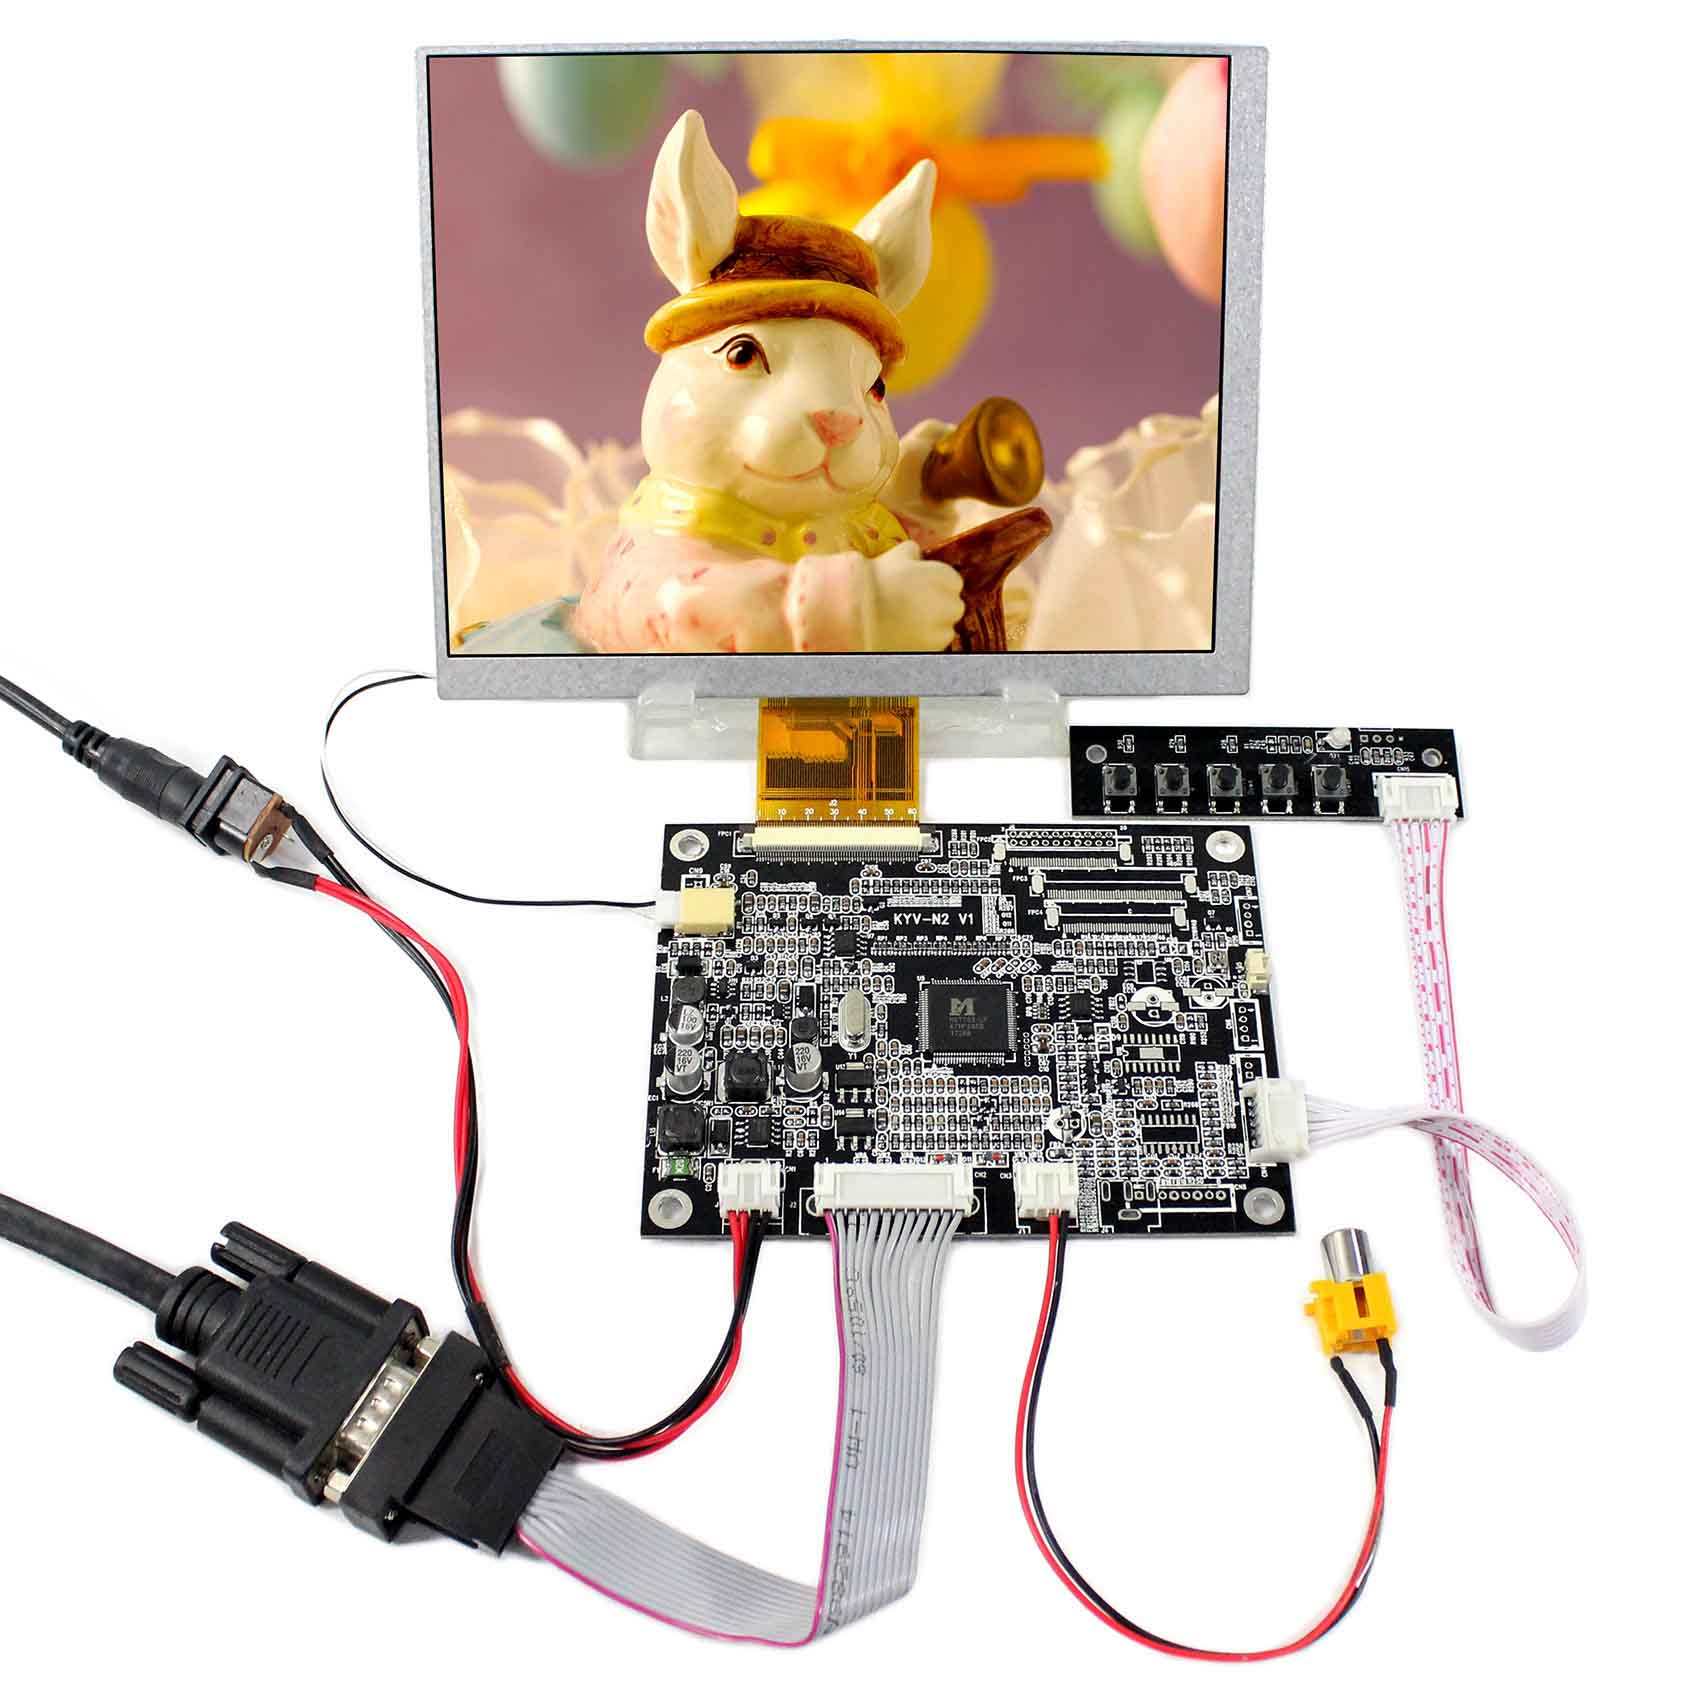 VGA AV LCD Controller Board+7inch CLAA070MA0ACW 7inch 800x600 Screen